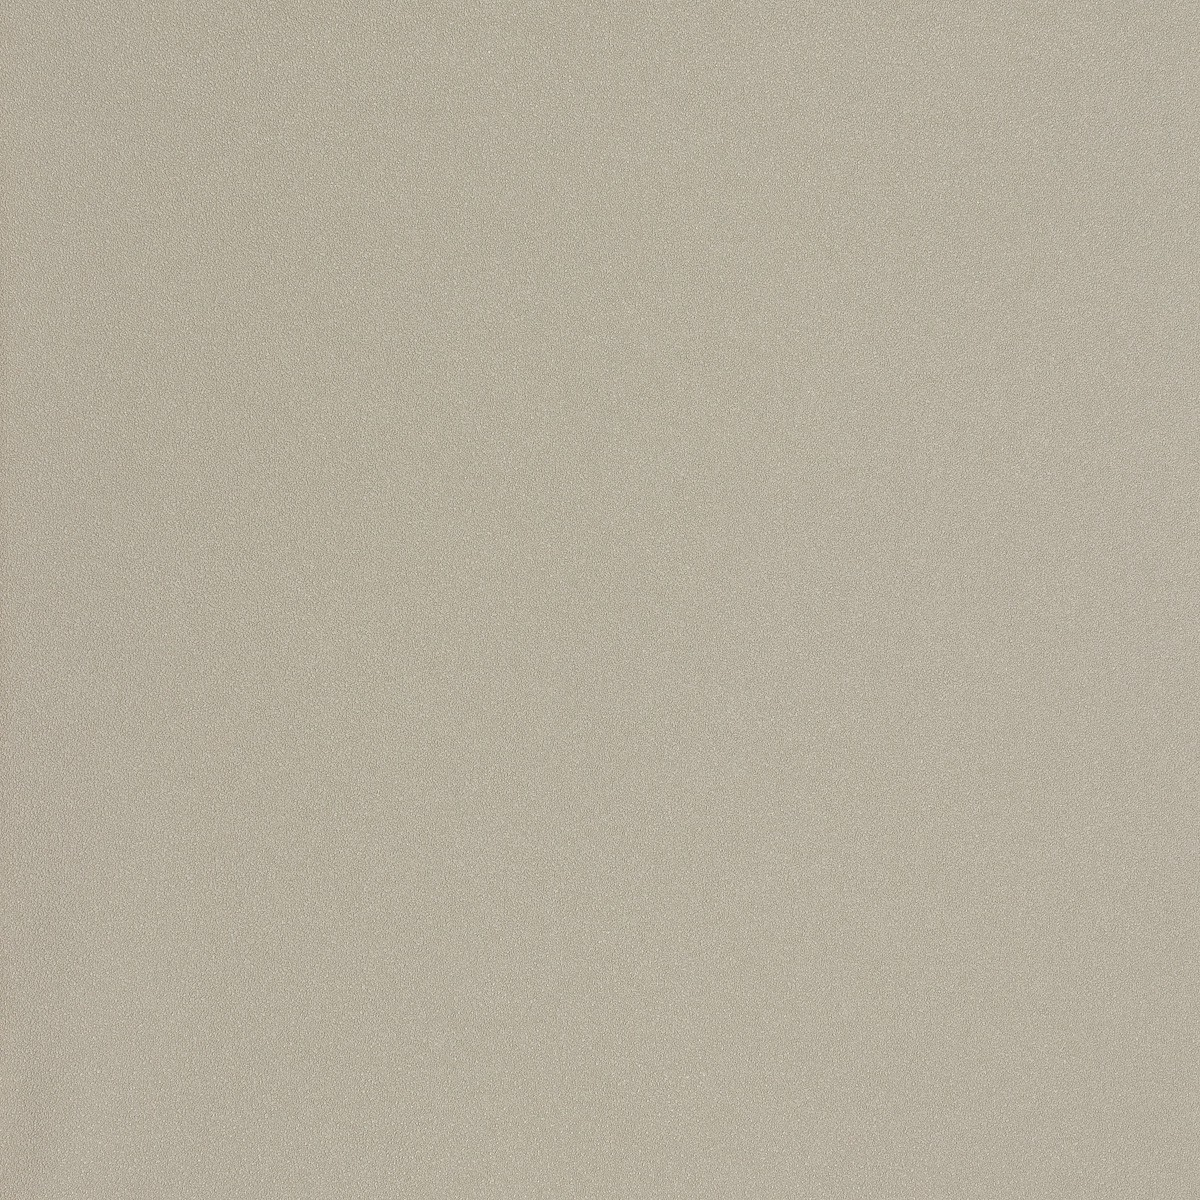 Vliestapete Glööckler Uni Struktur grau beige Metallic 52571